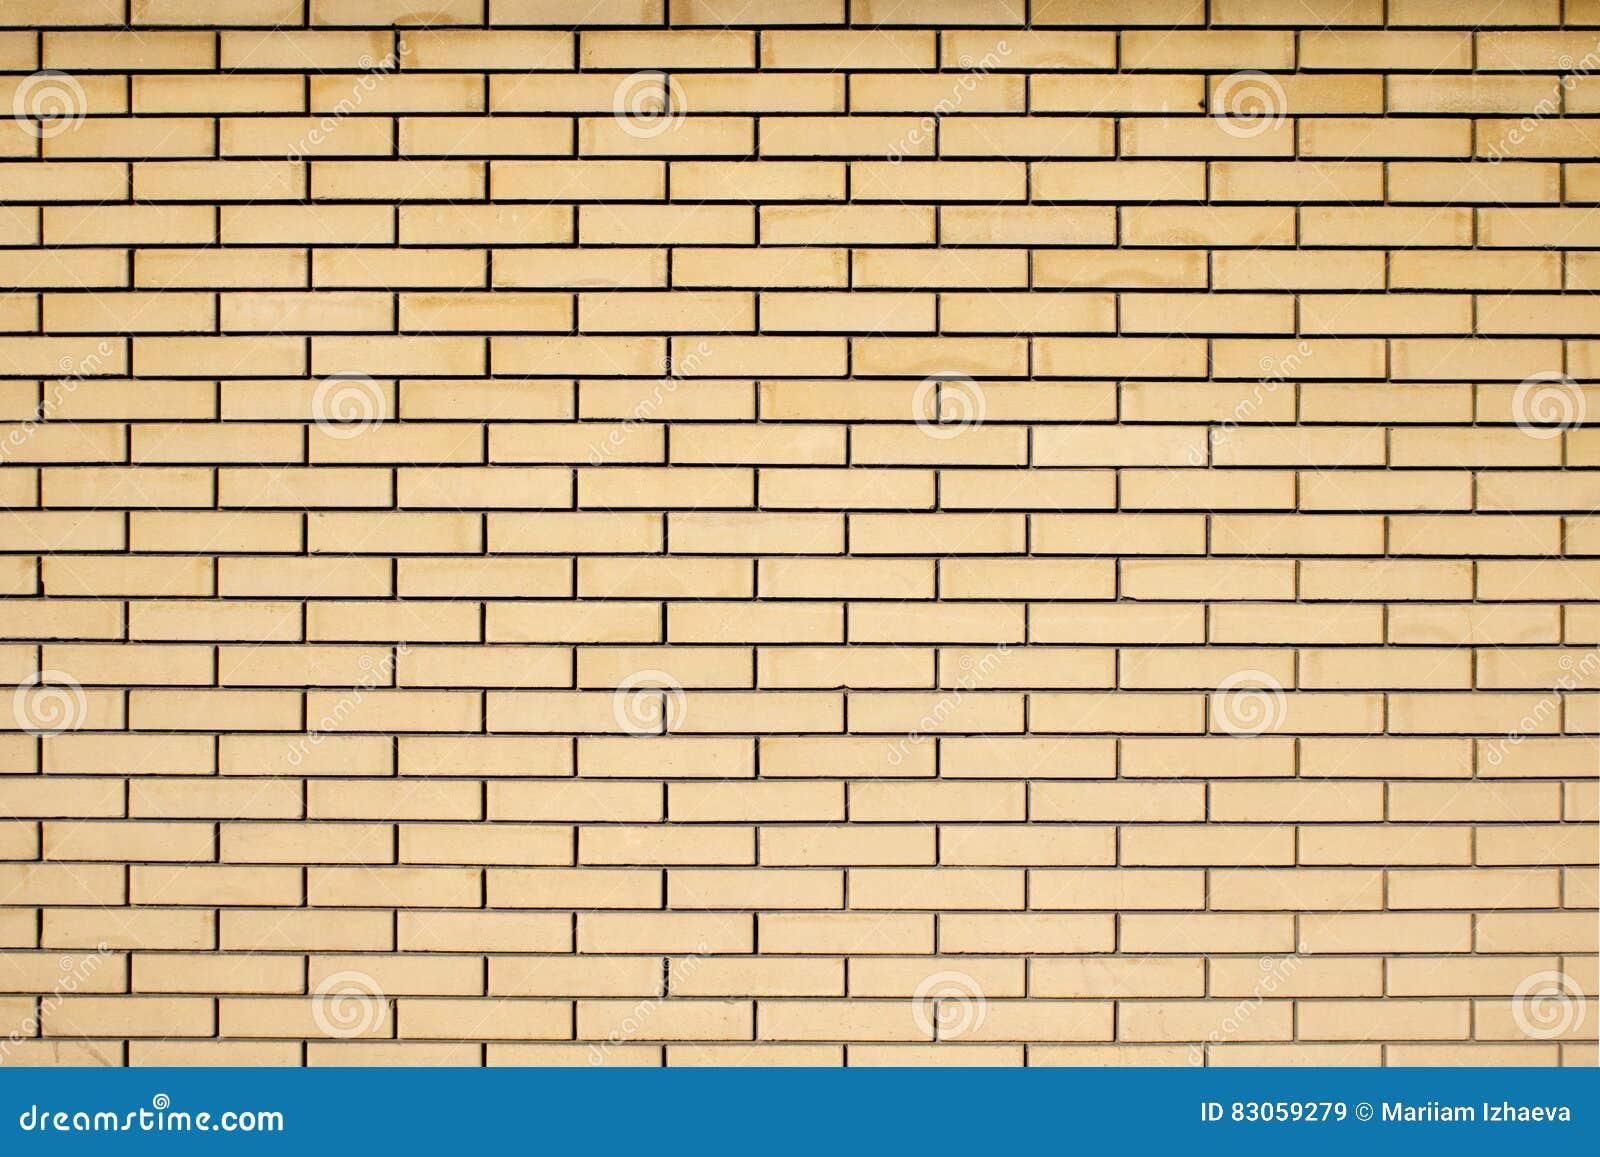 High Resolution Texture Of A Yellow Brick Wall. Laying Horizonta ...